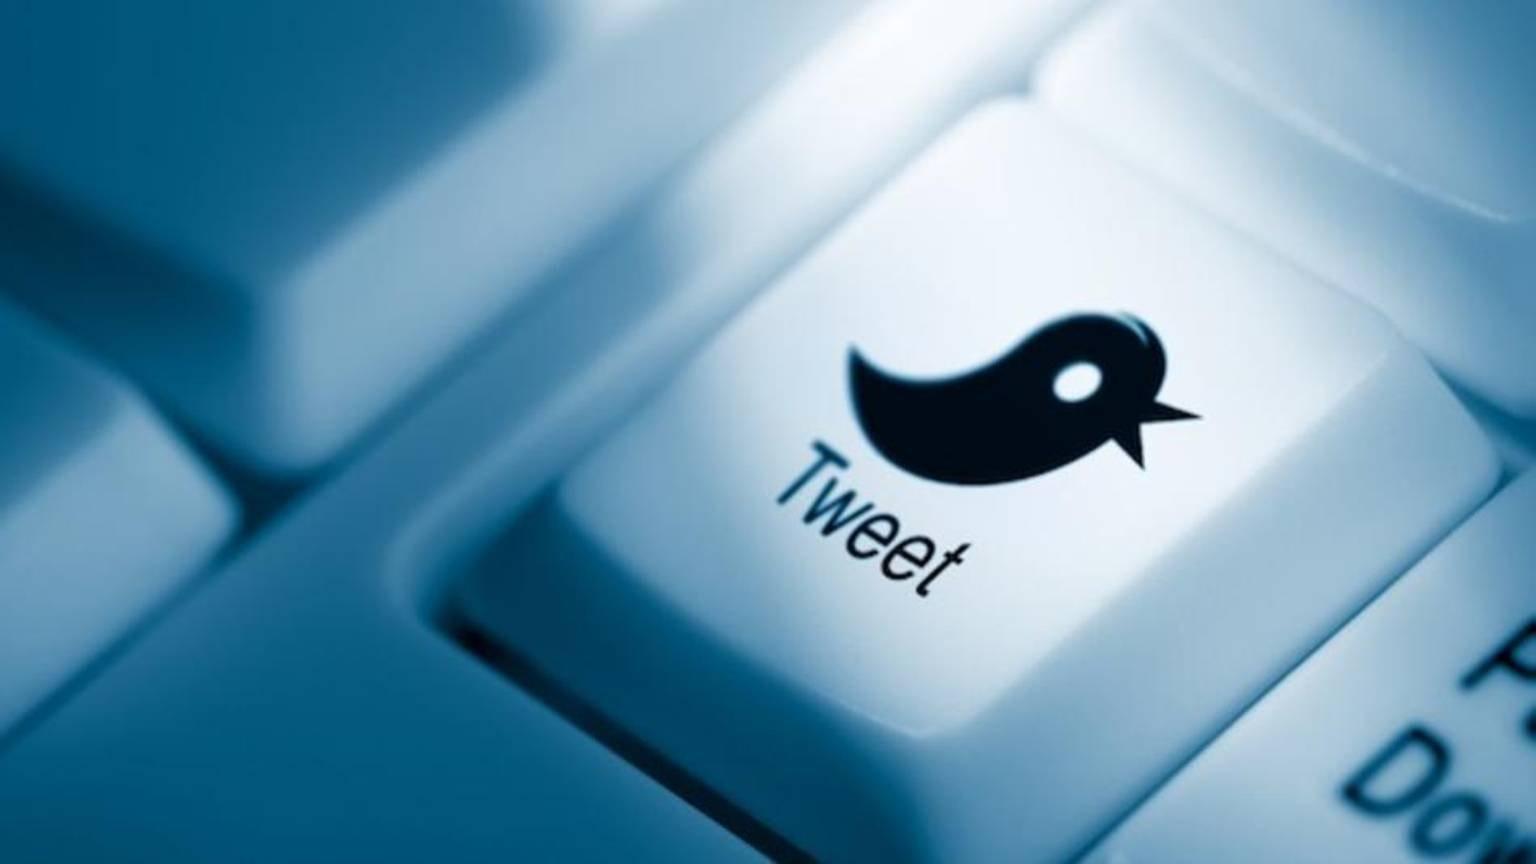 Гендиректор Twitter опроверг скорые изменения и хэштег #RIPTwitter